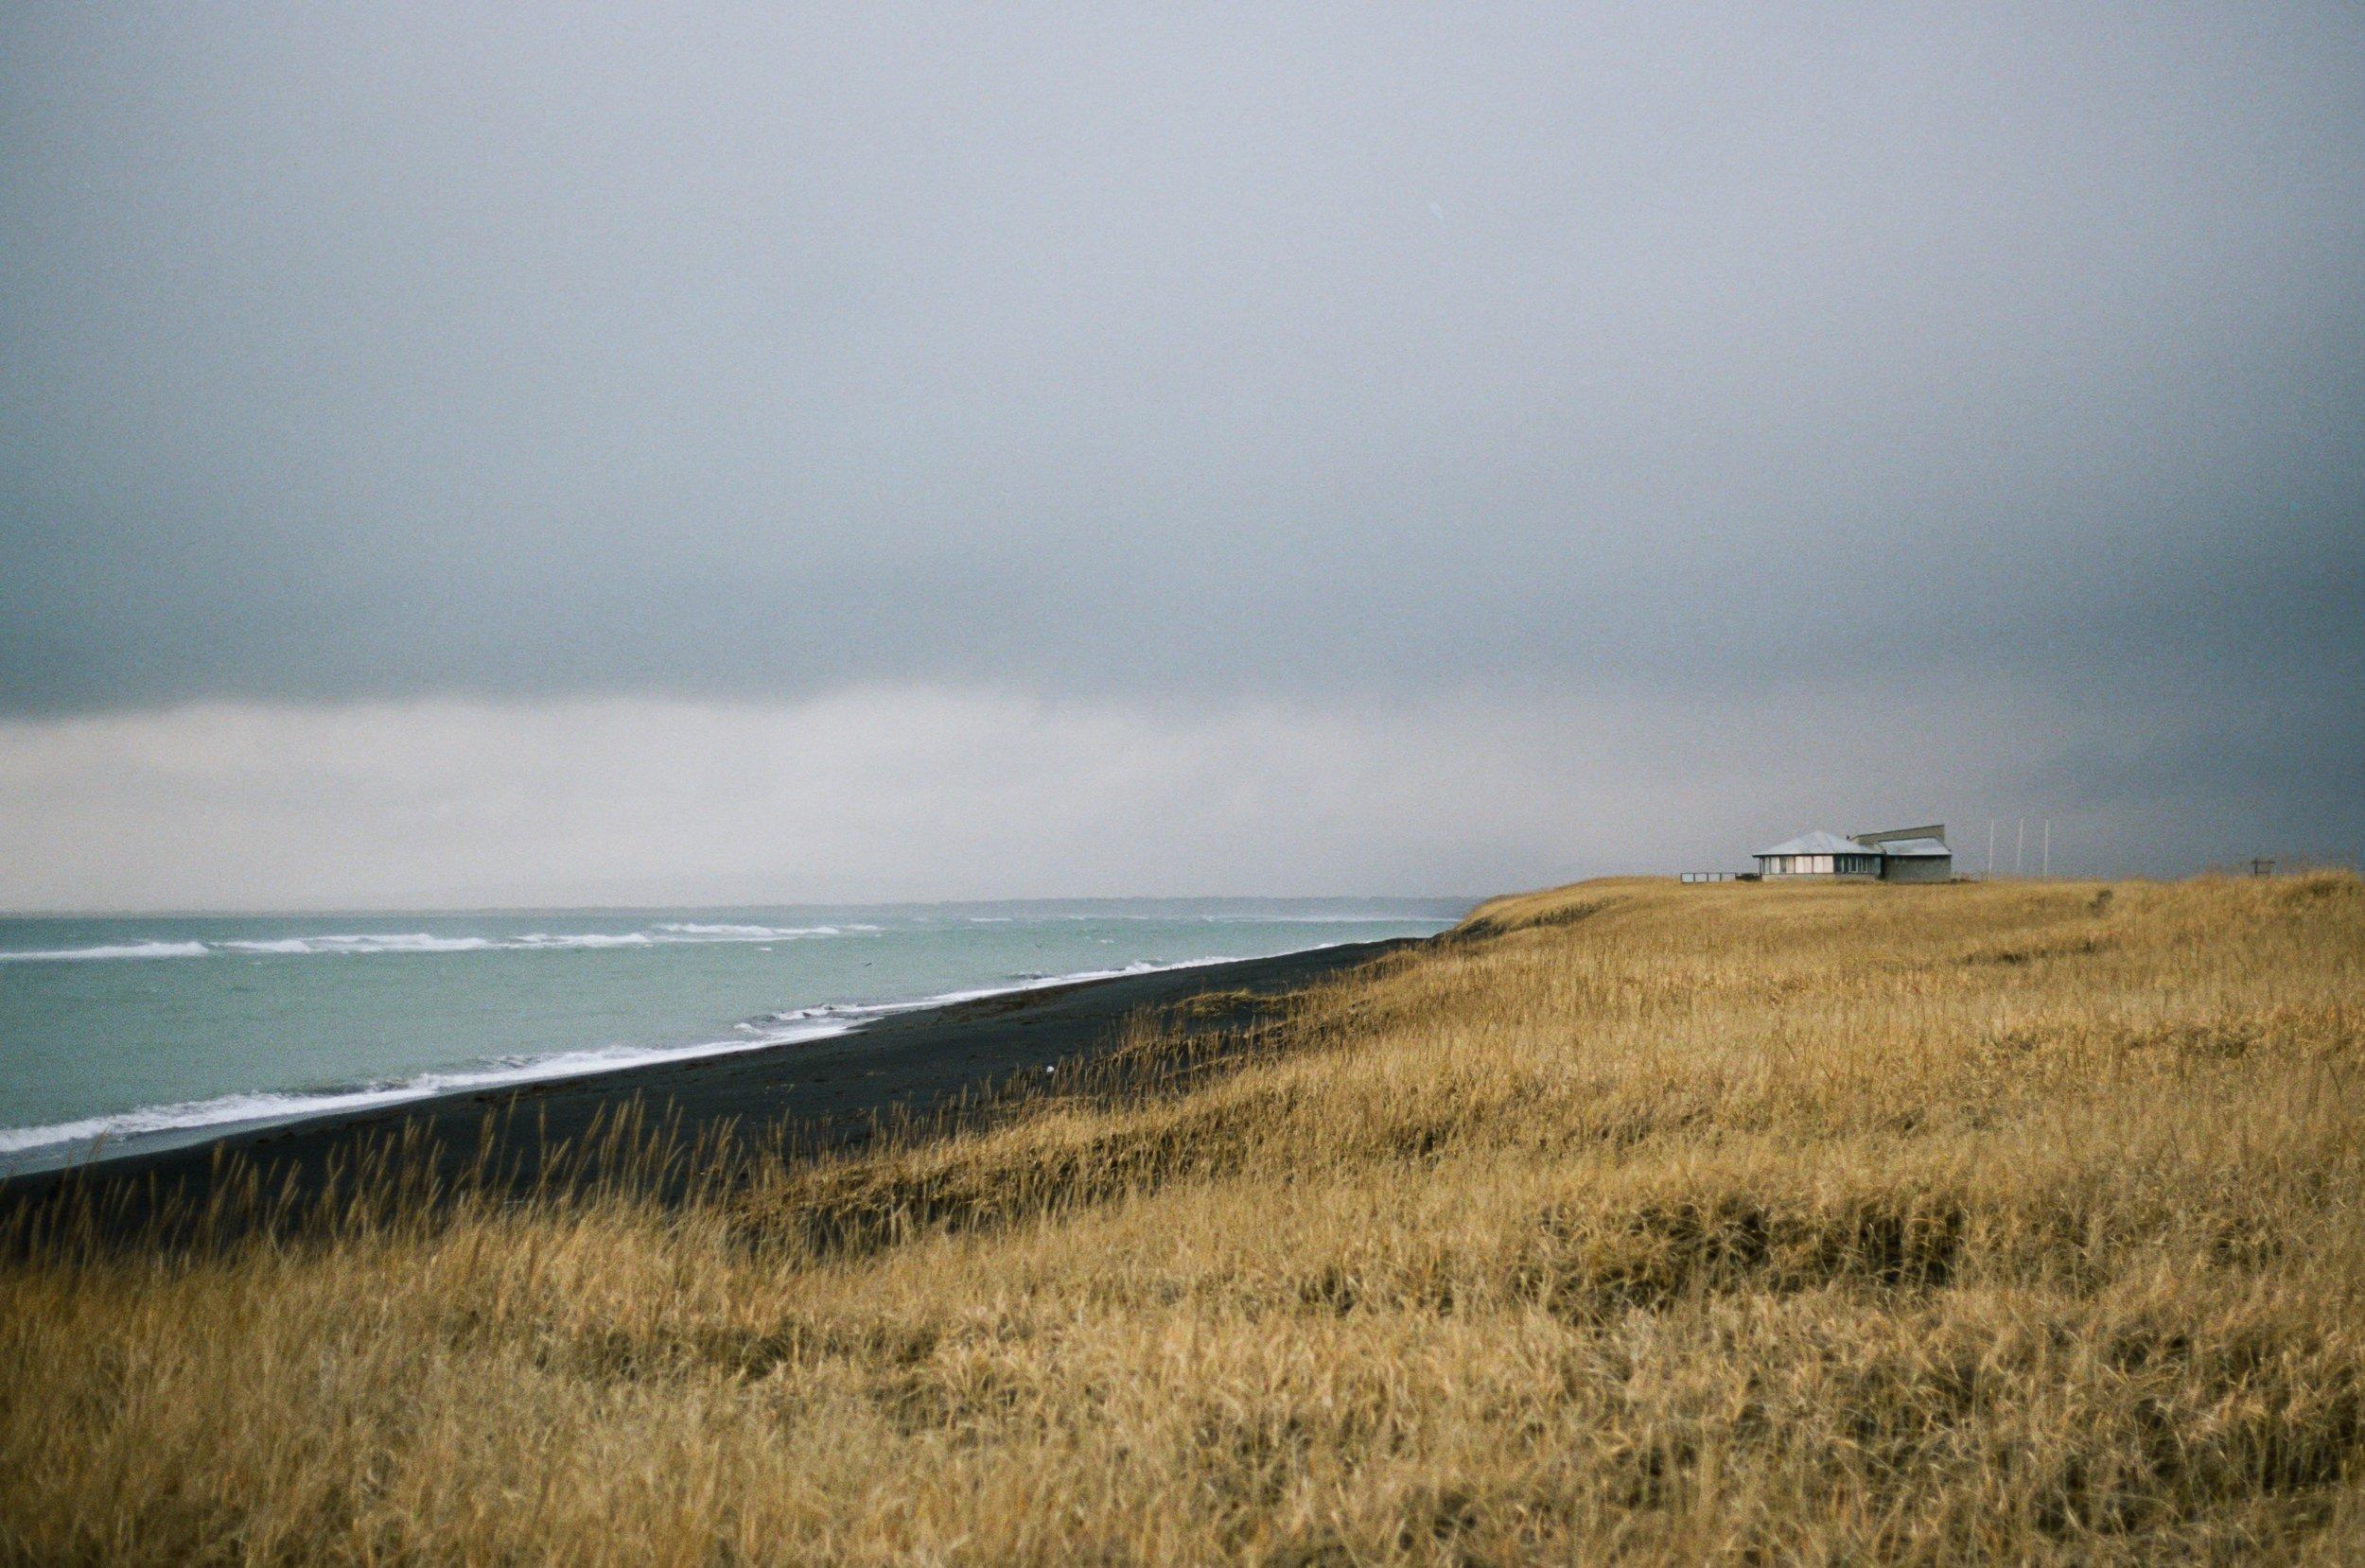 Icelandic House, 35mm Porta 400